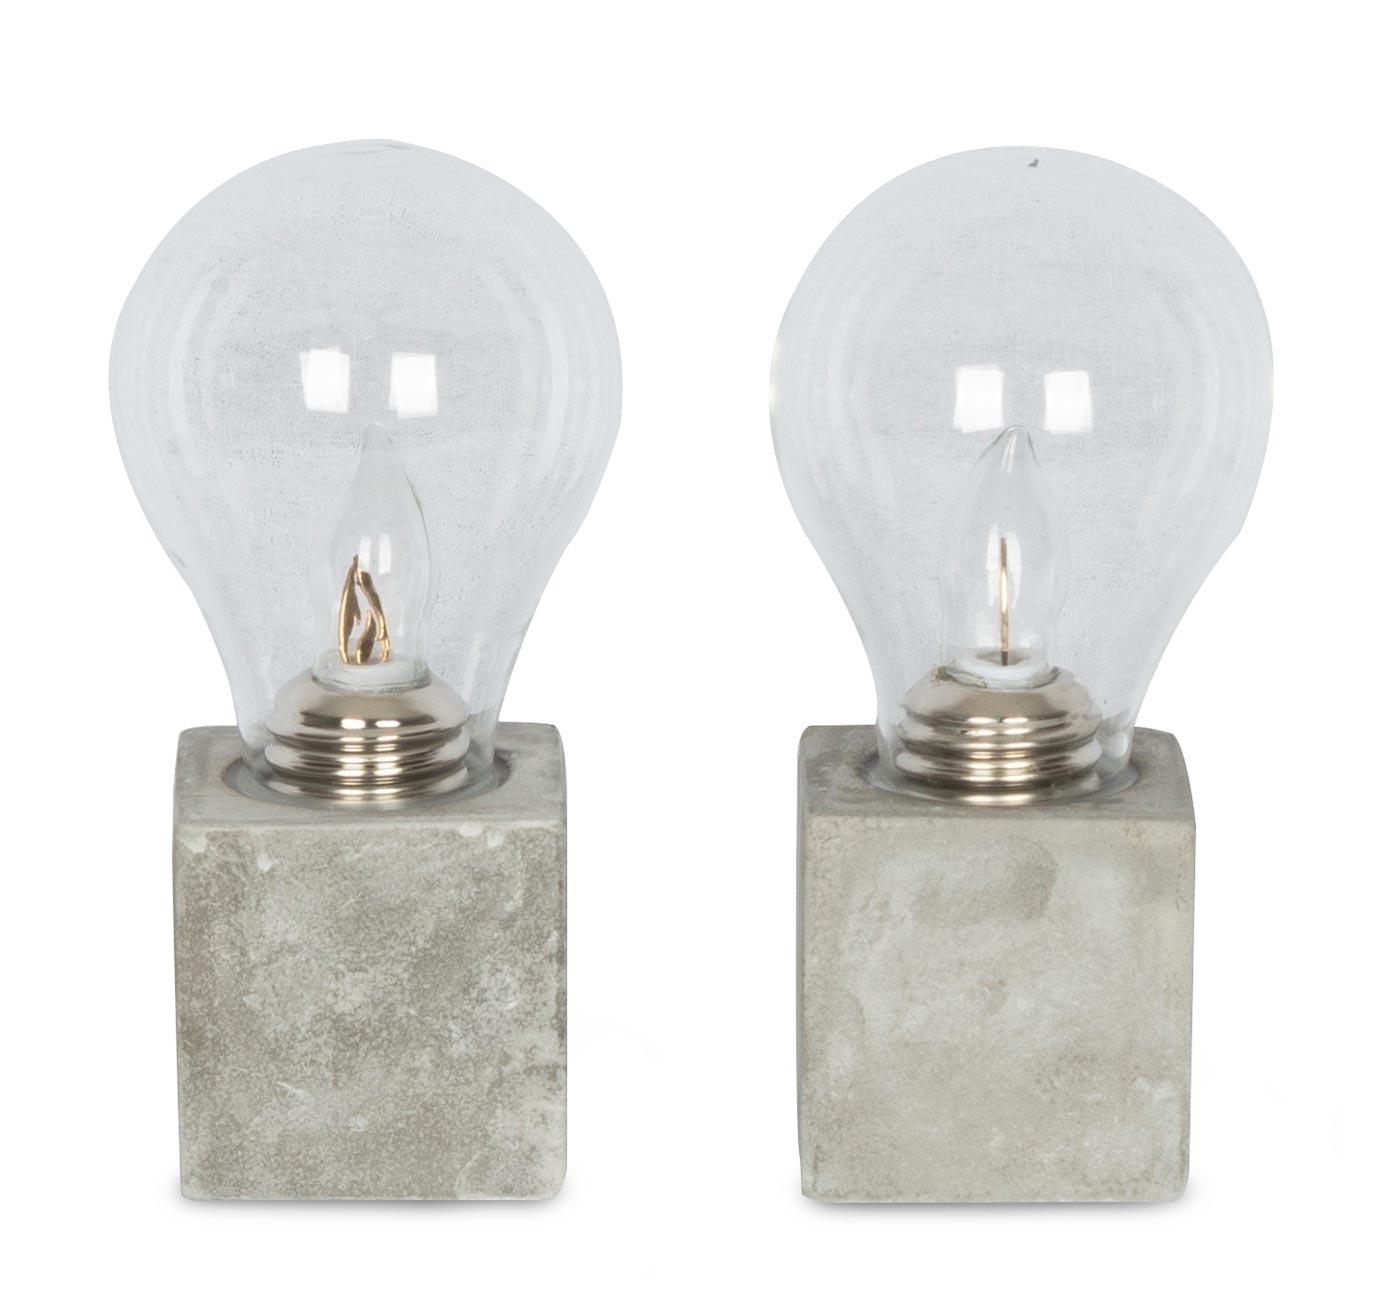 2er set tischleuchte 9 5x20cm led gl hbirne beton tischlampe deko glas kaufen bei living by. Black Bedroom Furniture Sets. Home Design Ideas